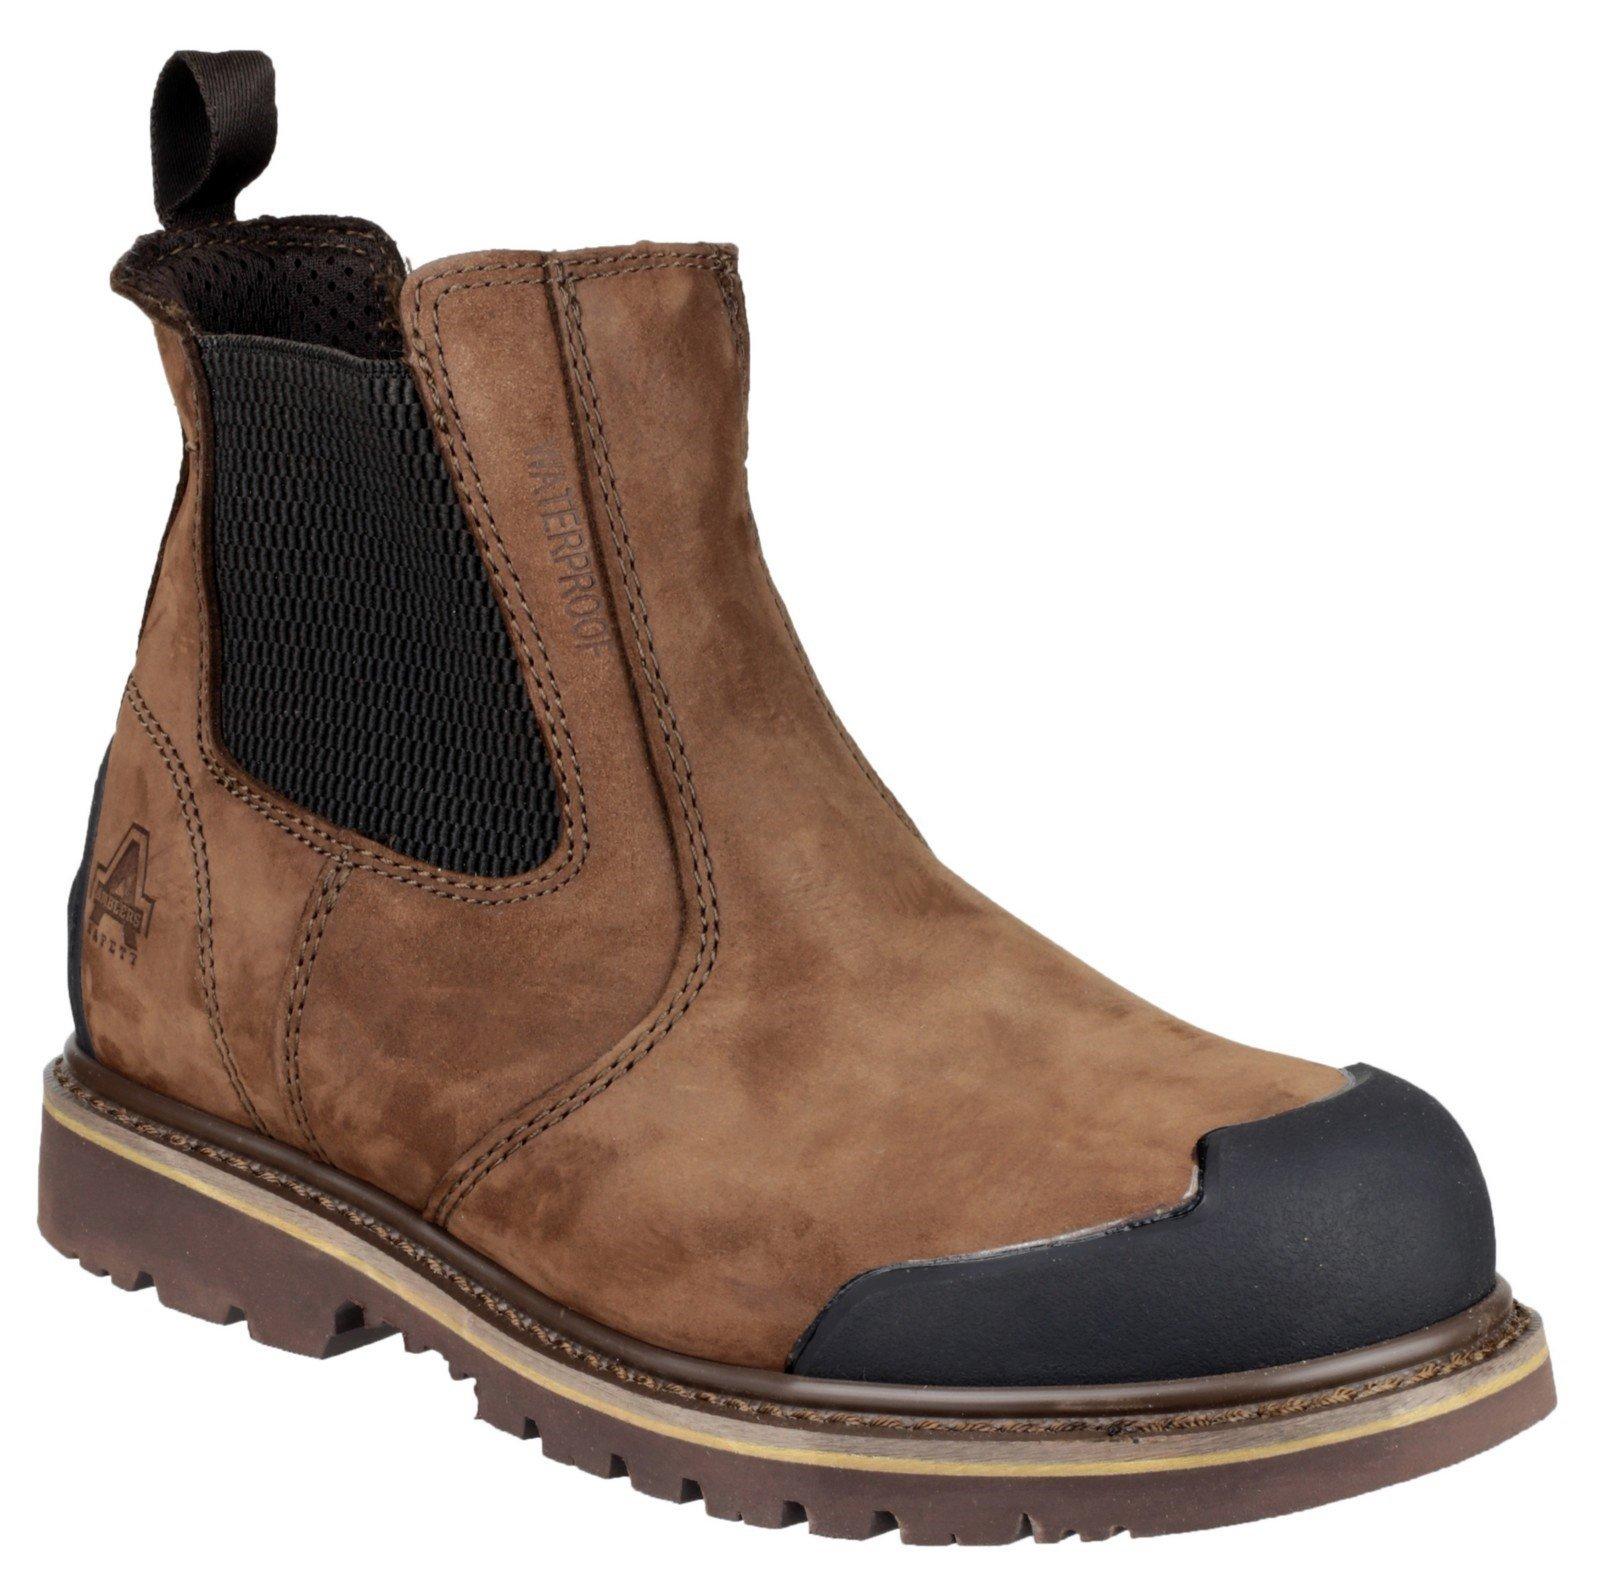 Amblers Unisex Safety Goodyear Waterproof Pull On Chelsea Boot Brown 20433 - Brown 6